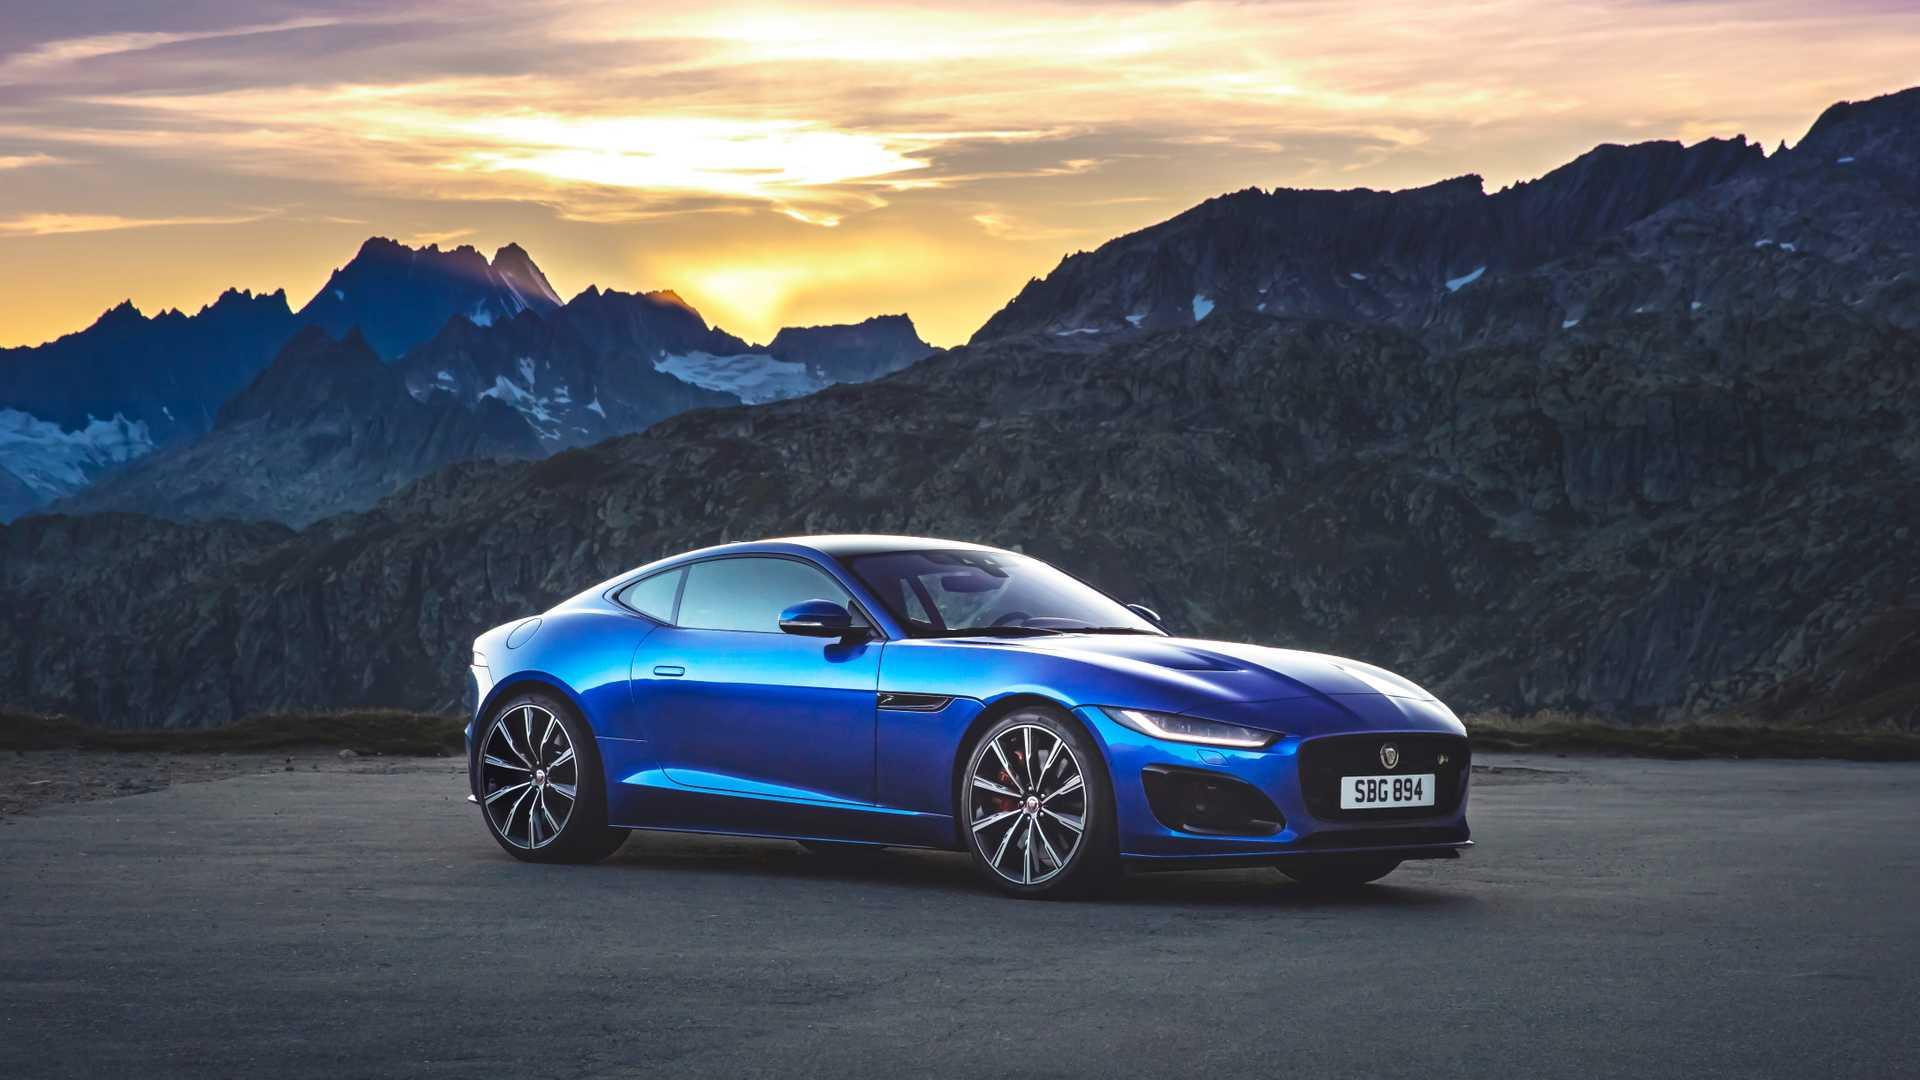 2021-jaguar-f-type-6